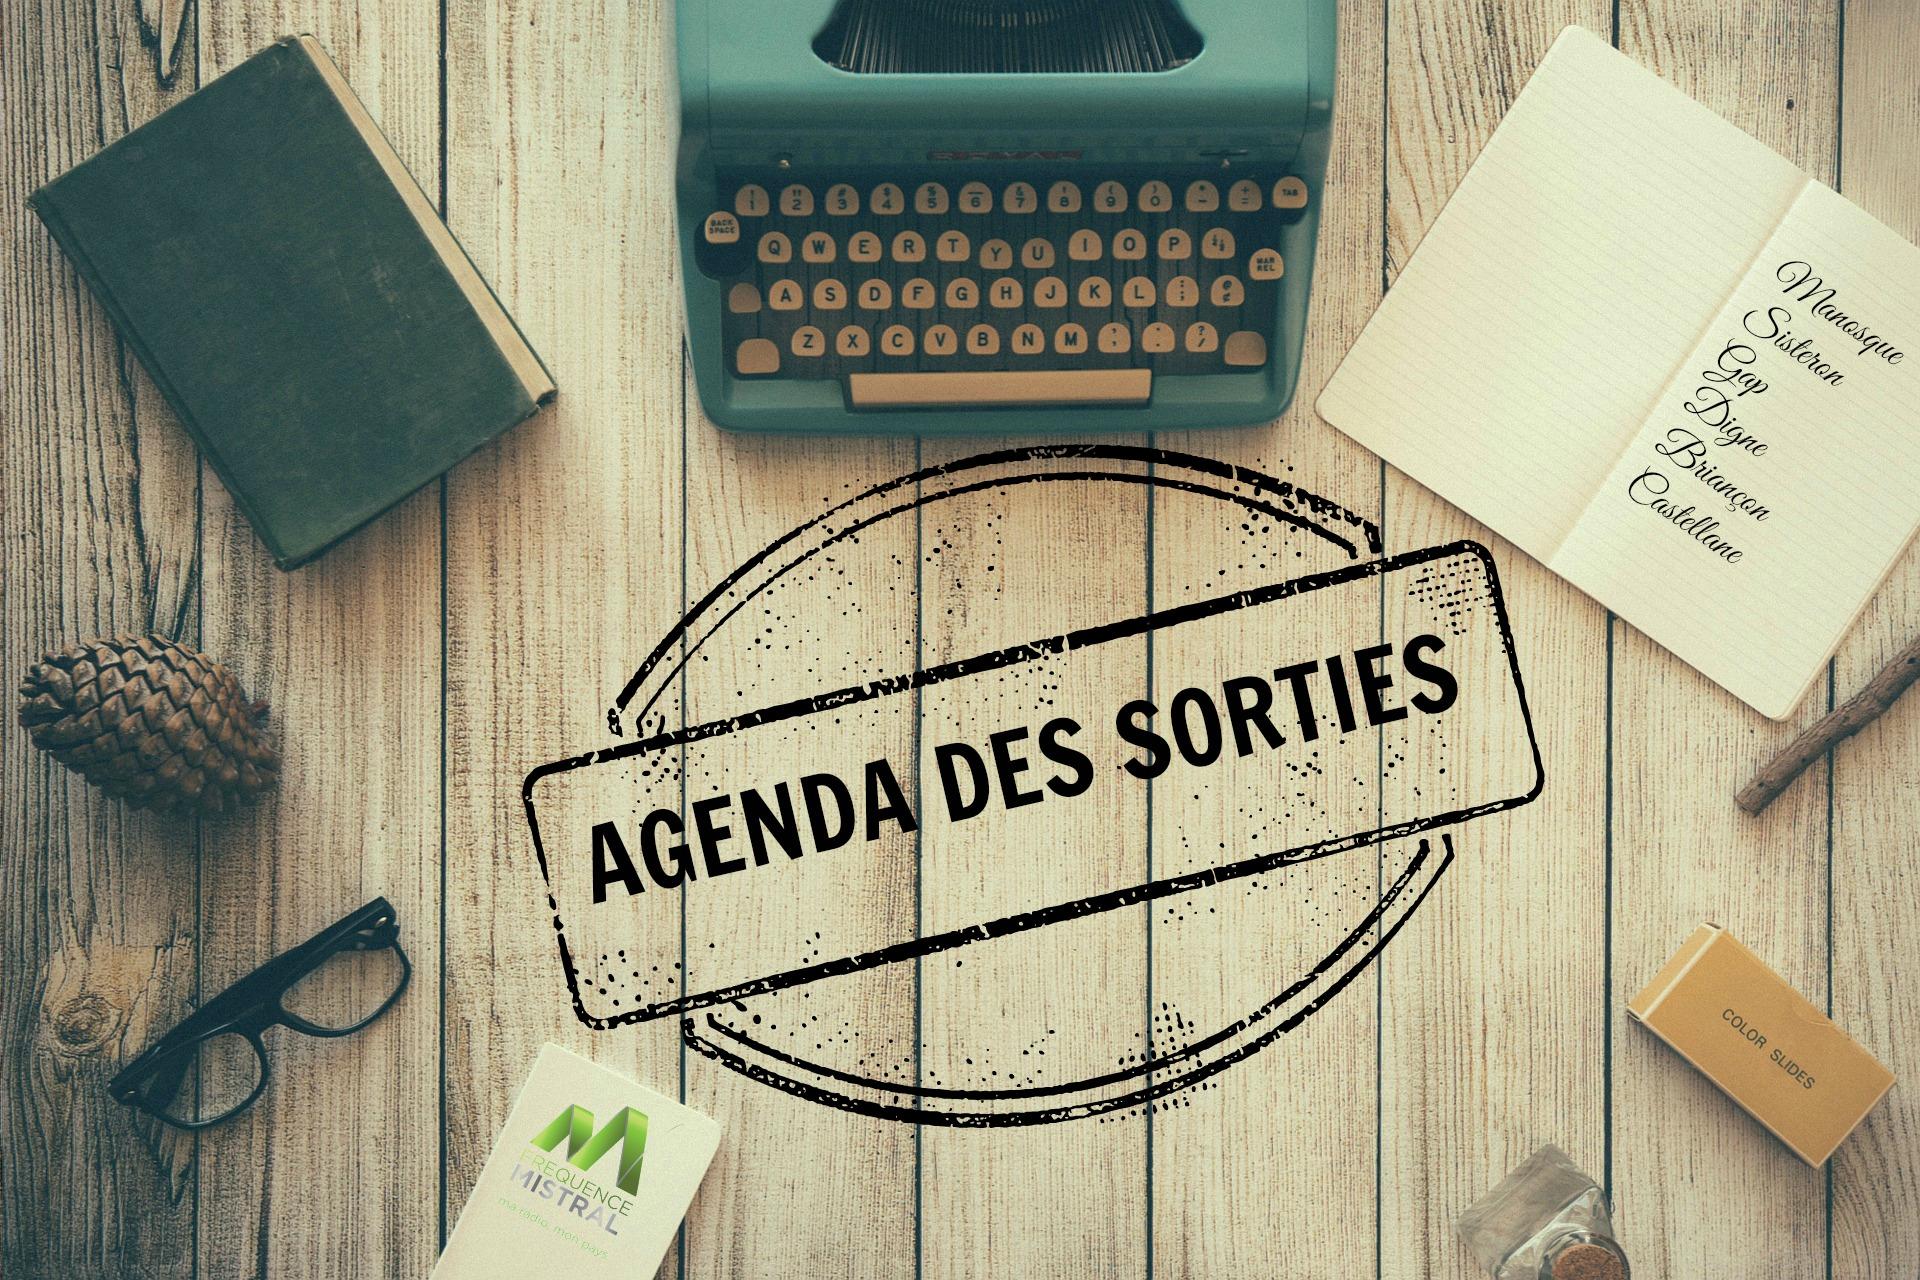 Agenda des sorties Gap du 15 au 17 Mars 2019